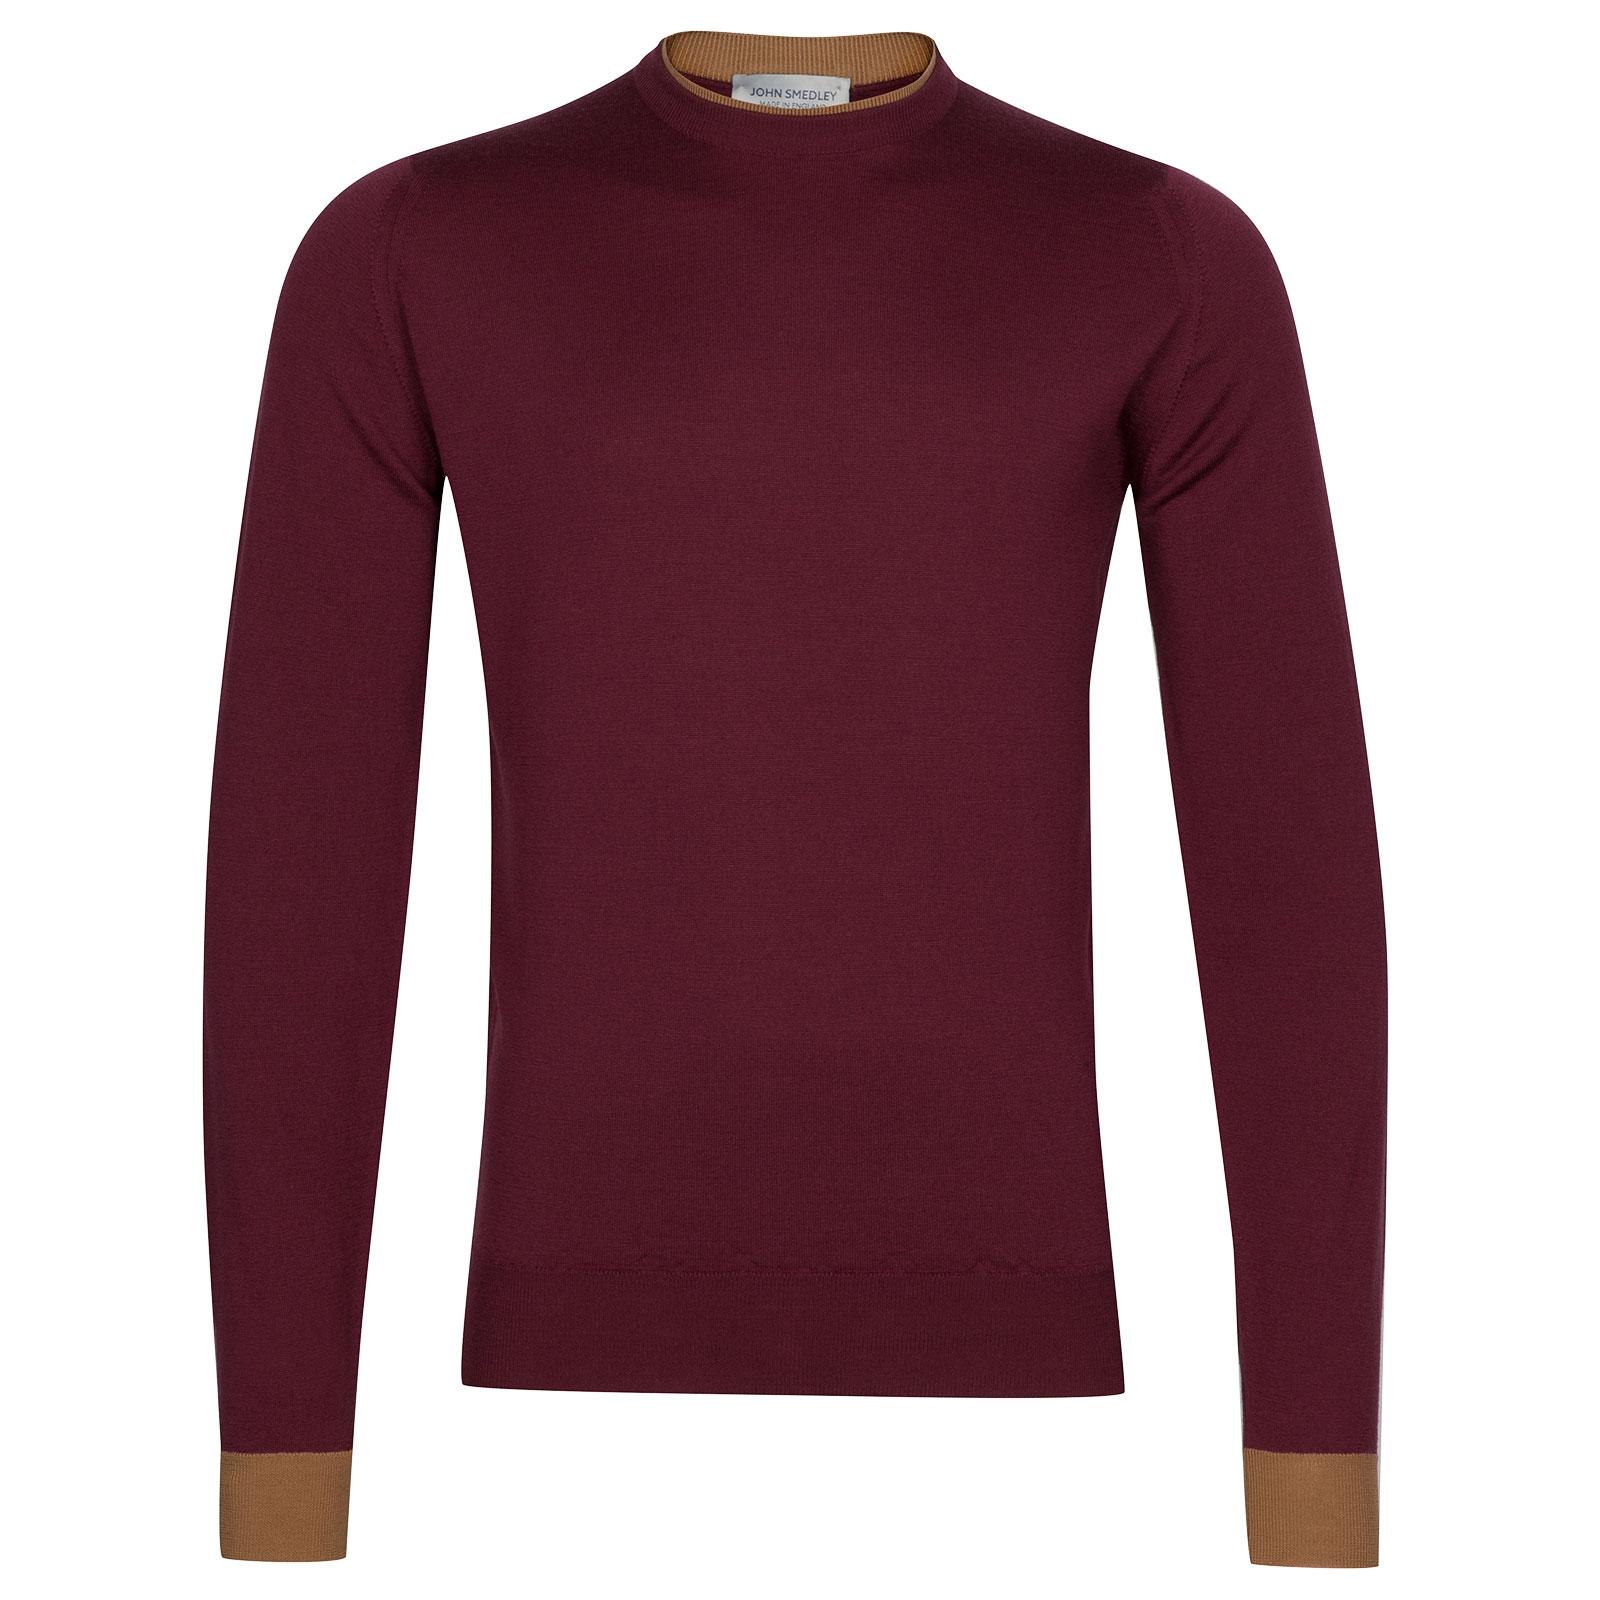 John Smedley Kenn Extra Fine Merino Pullover in Bordeaux-XXL